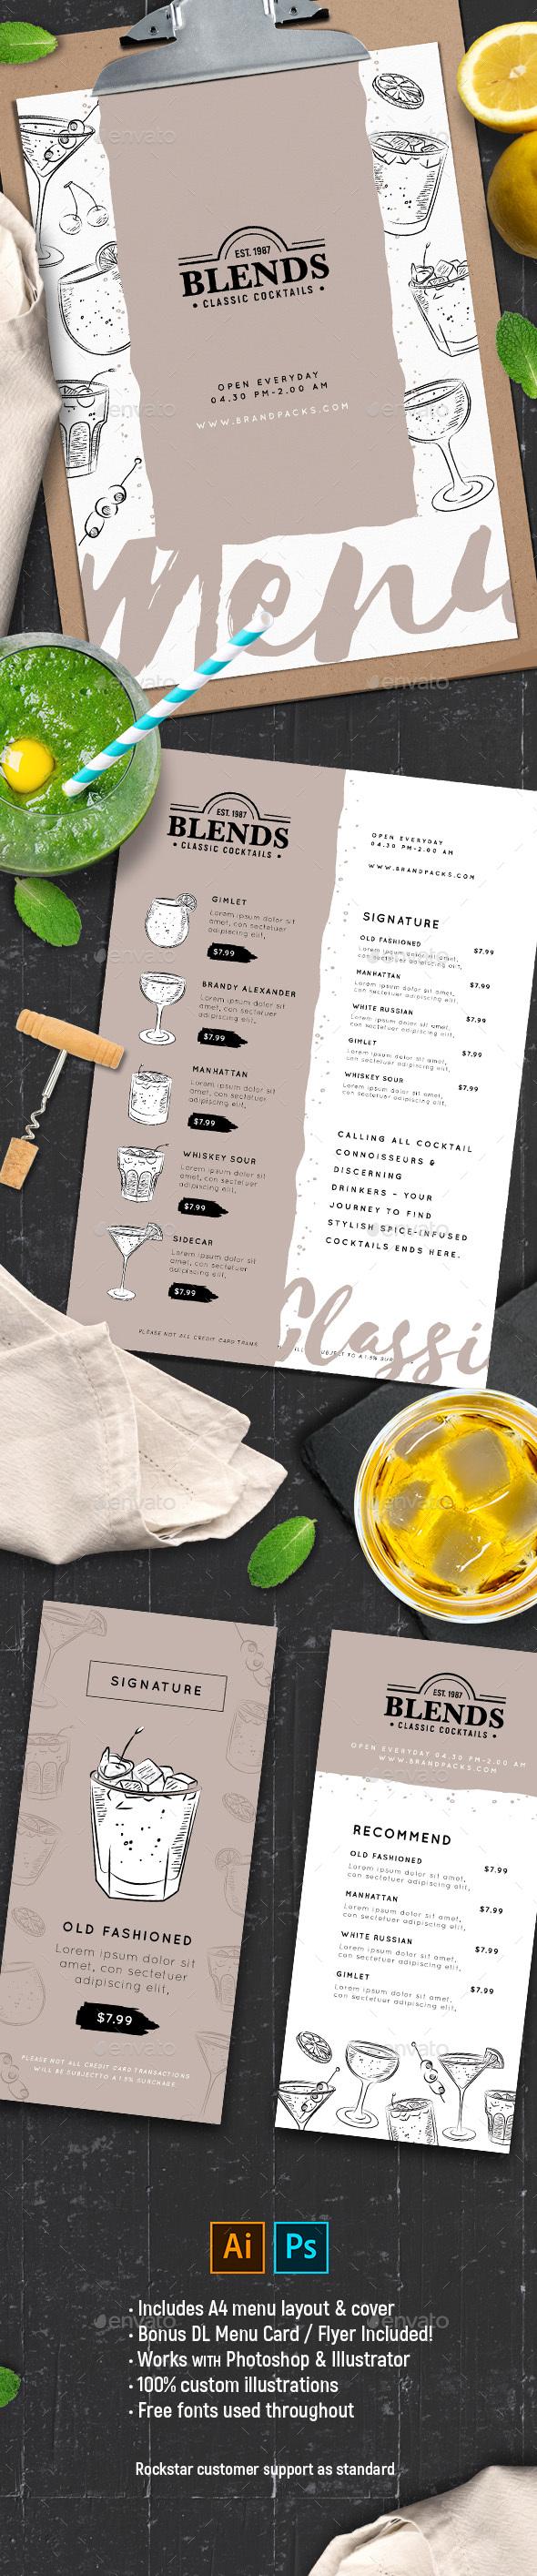 Cocktail Menu / Drink List Template Template - Food Menus Print Templates